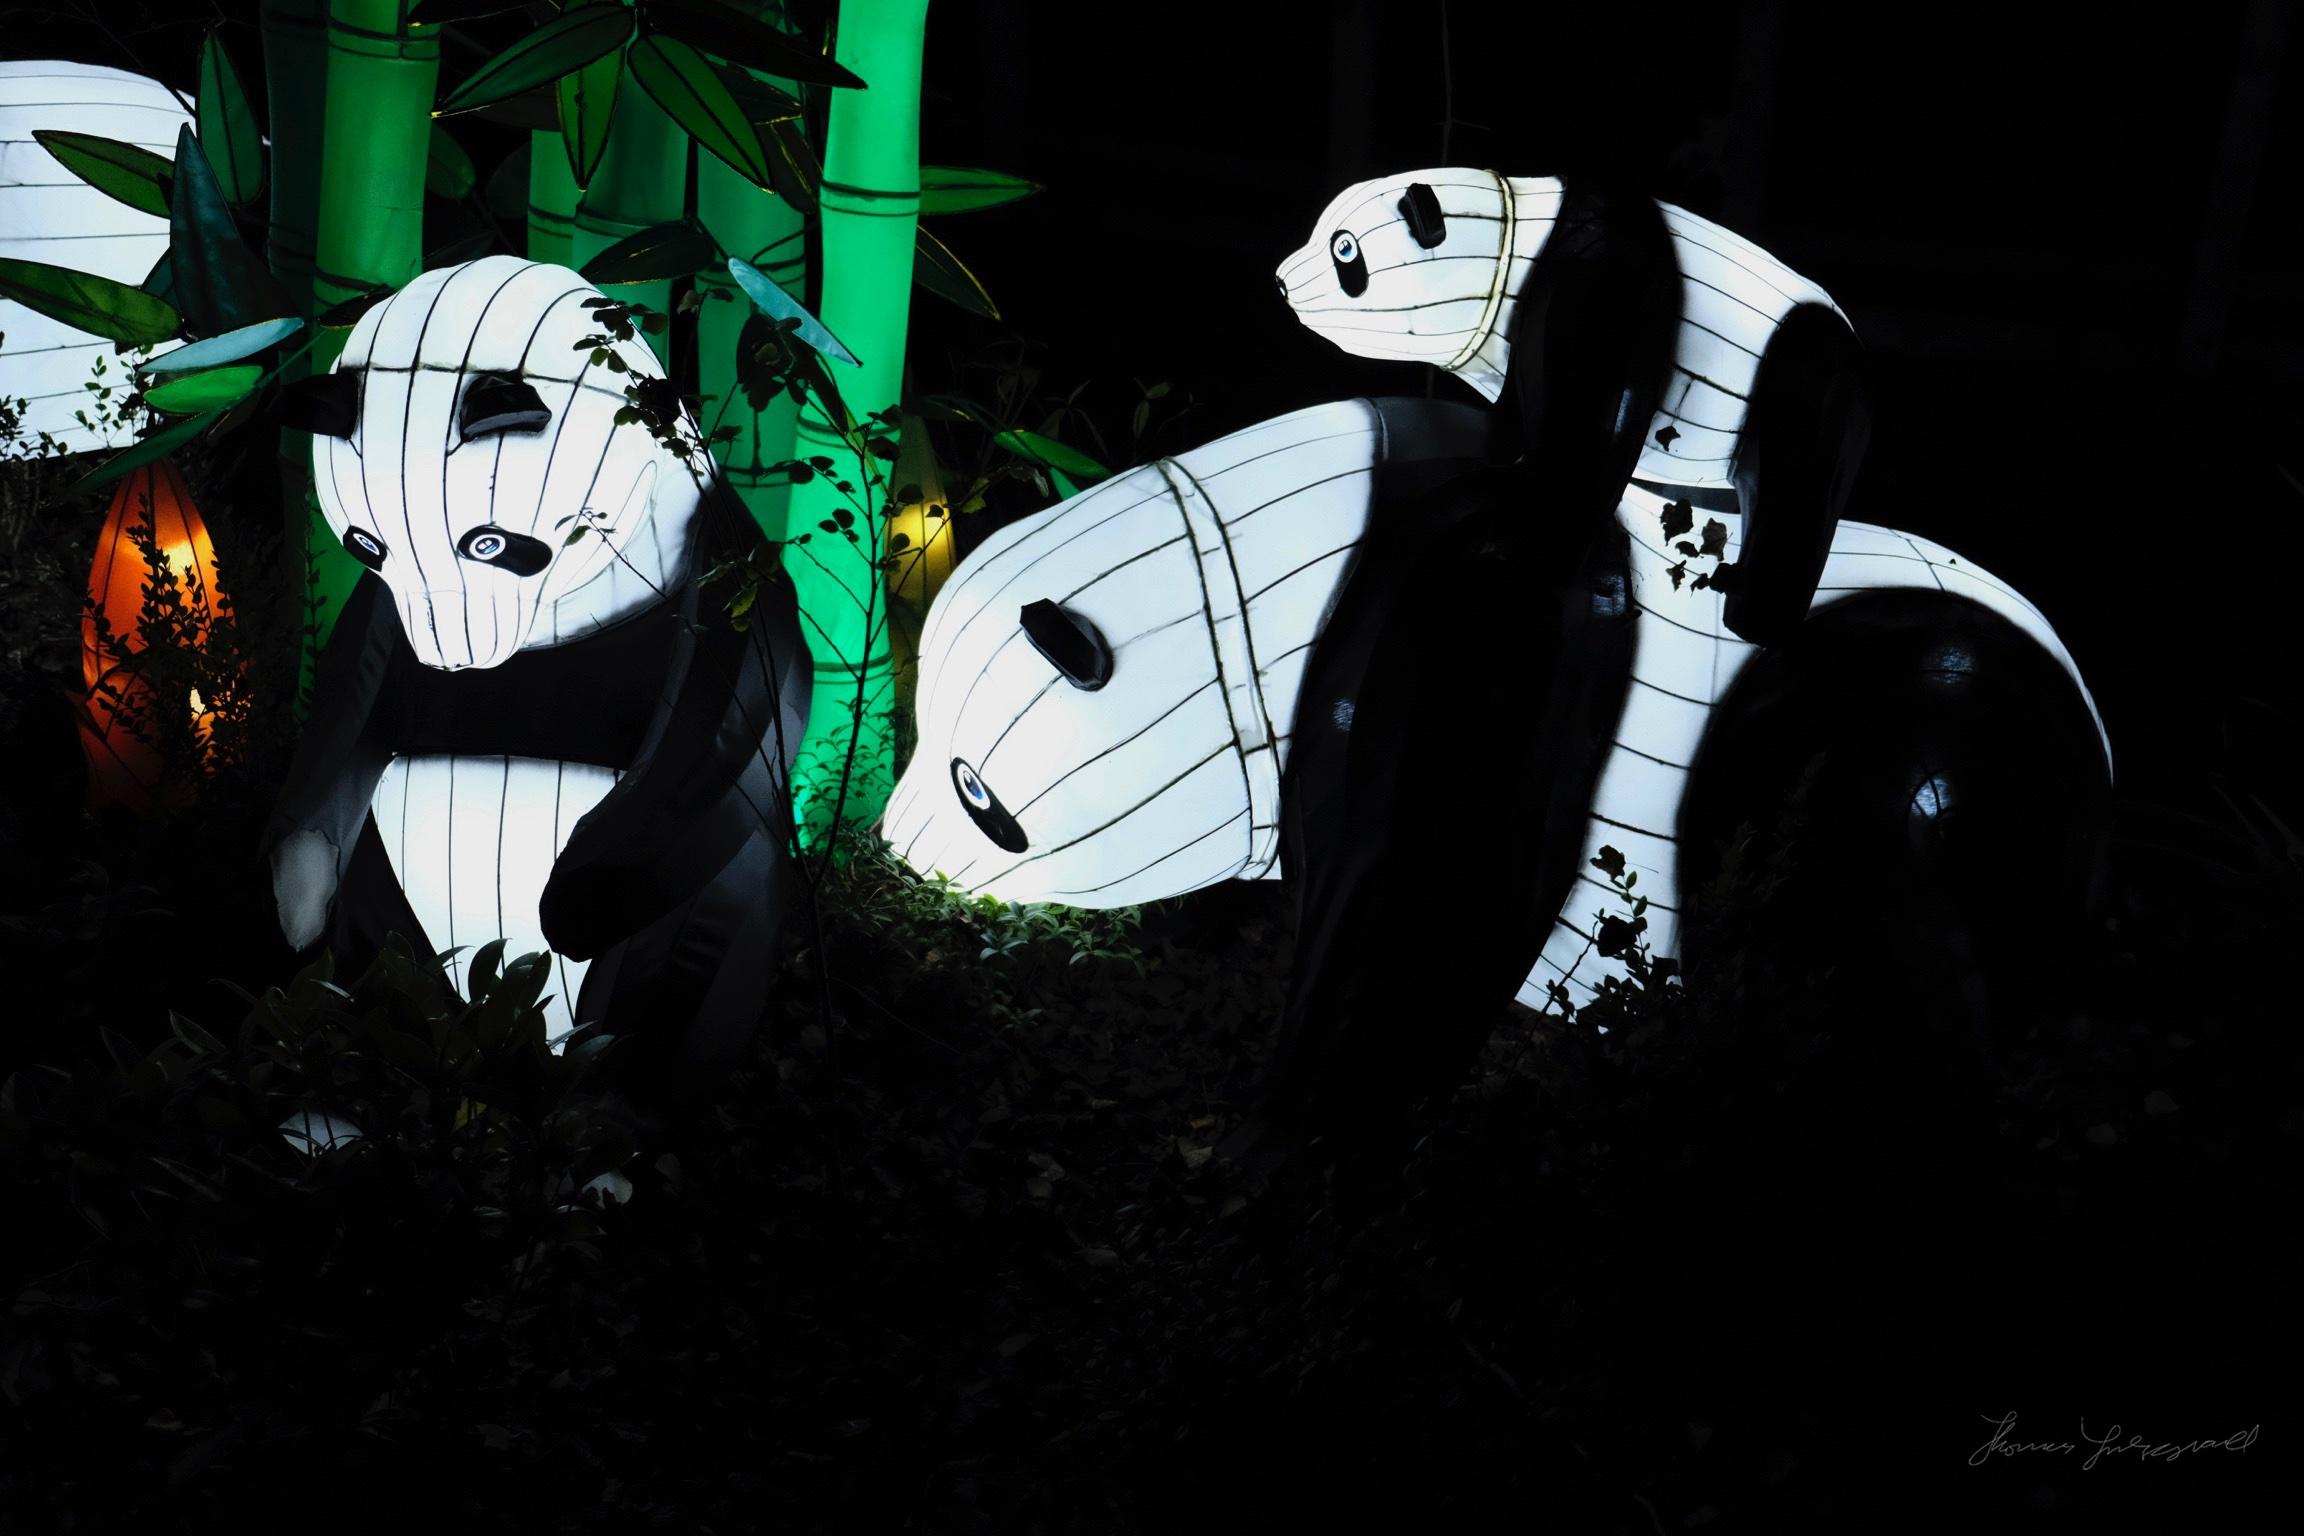 Wild-Lights-Dublin-Zoo-007.jpg